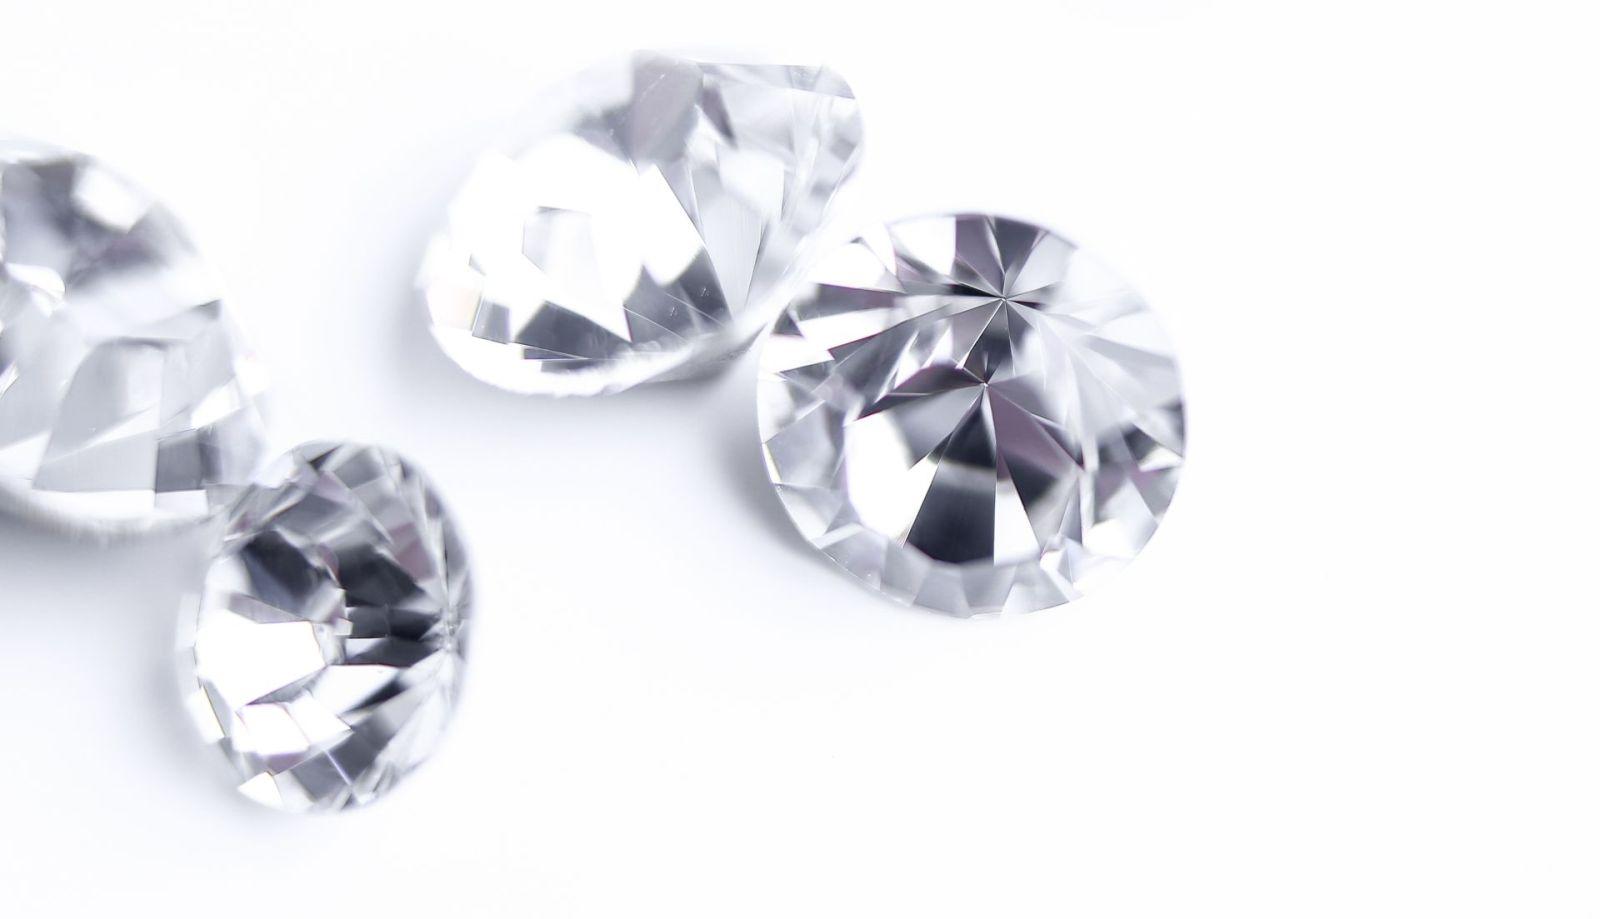 Shiny diamonds - Real or Fake?